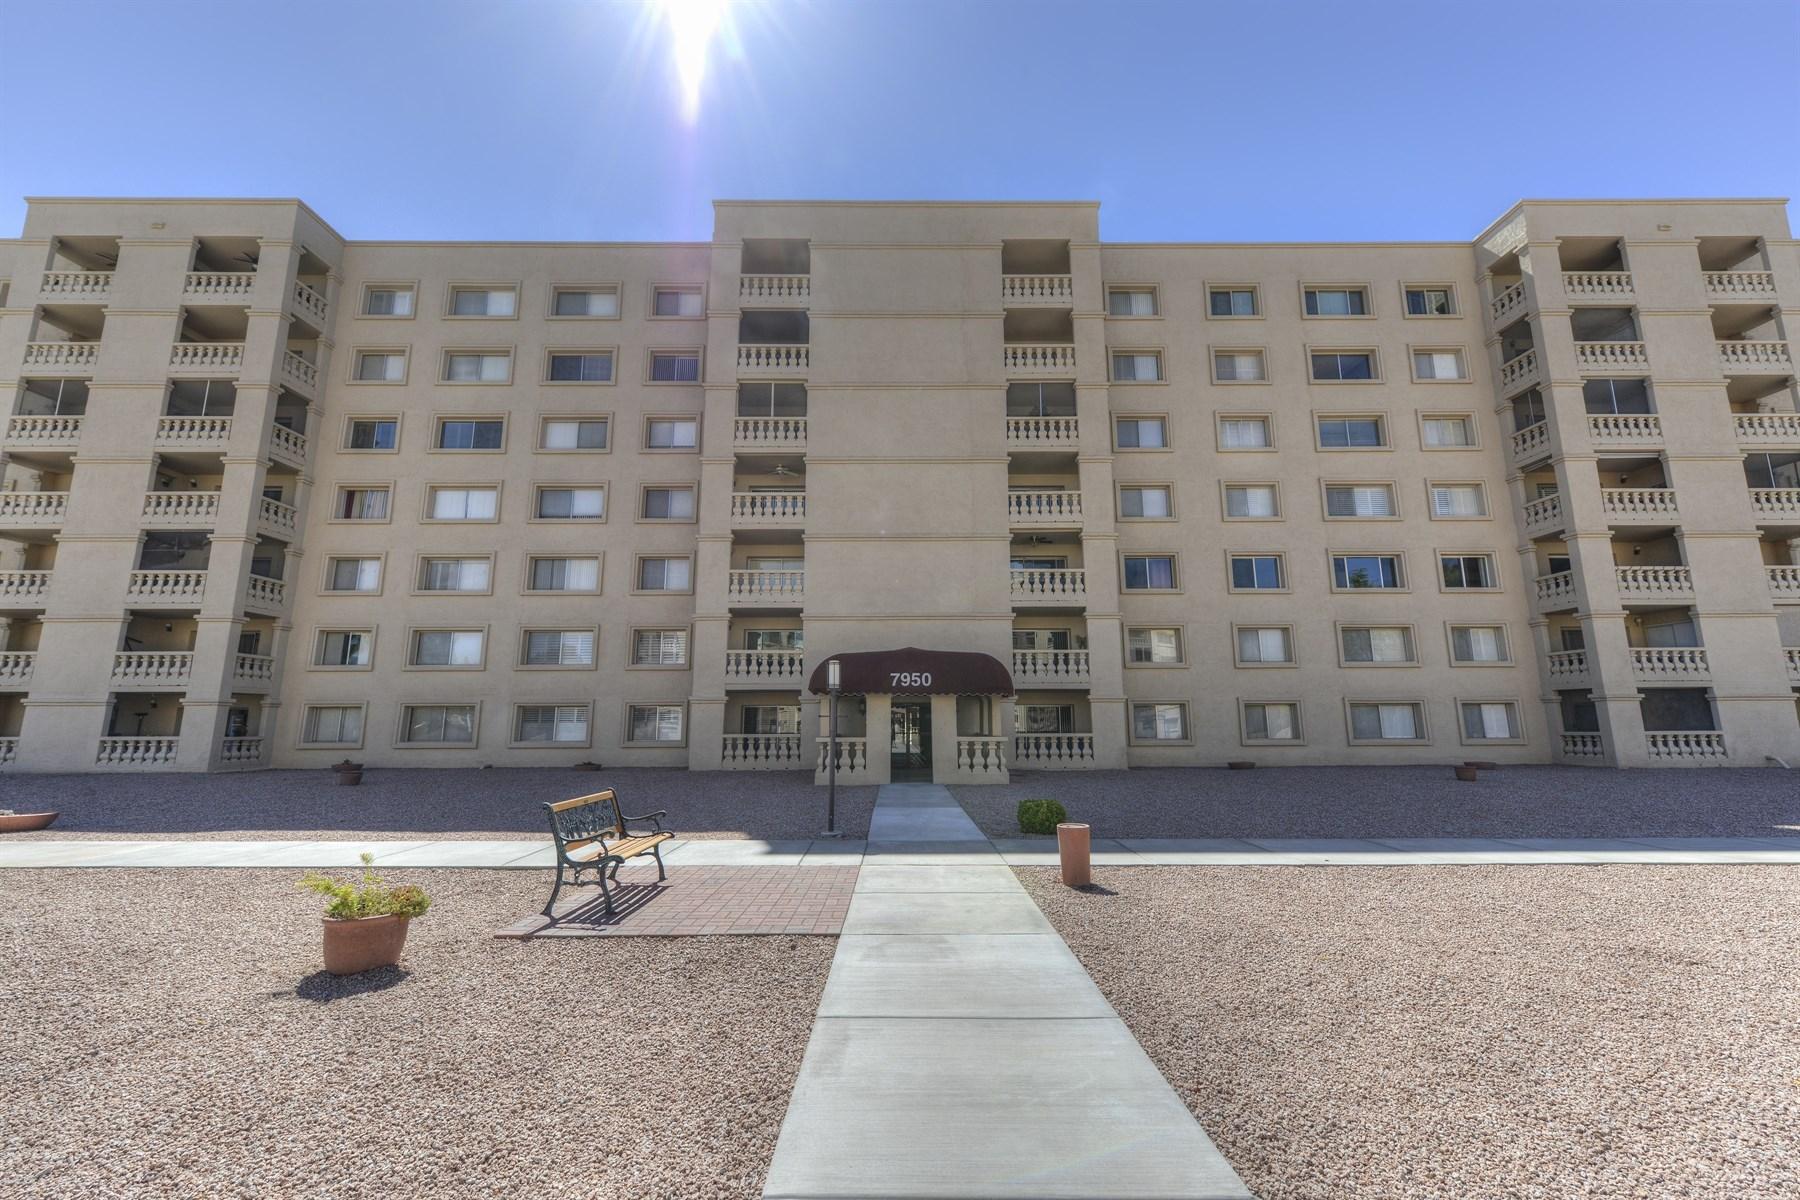 Apartamento por un Venta en Resort style living at a premium location 7950 E CAMELBACK RD #303 Scottsdale, Arizona 85251 Estados Unidos